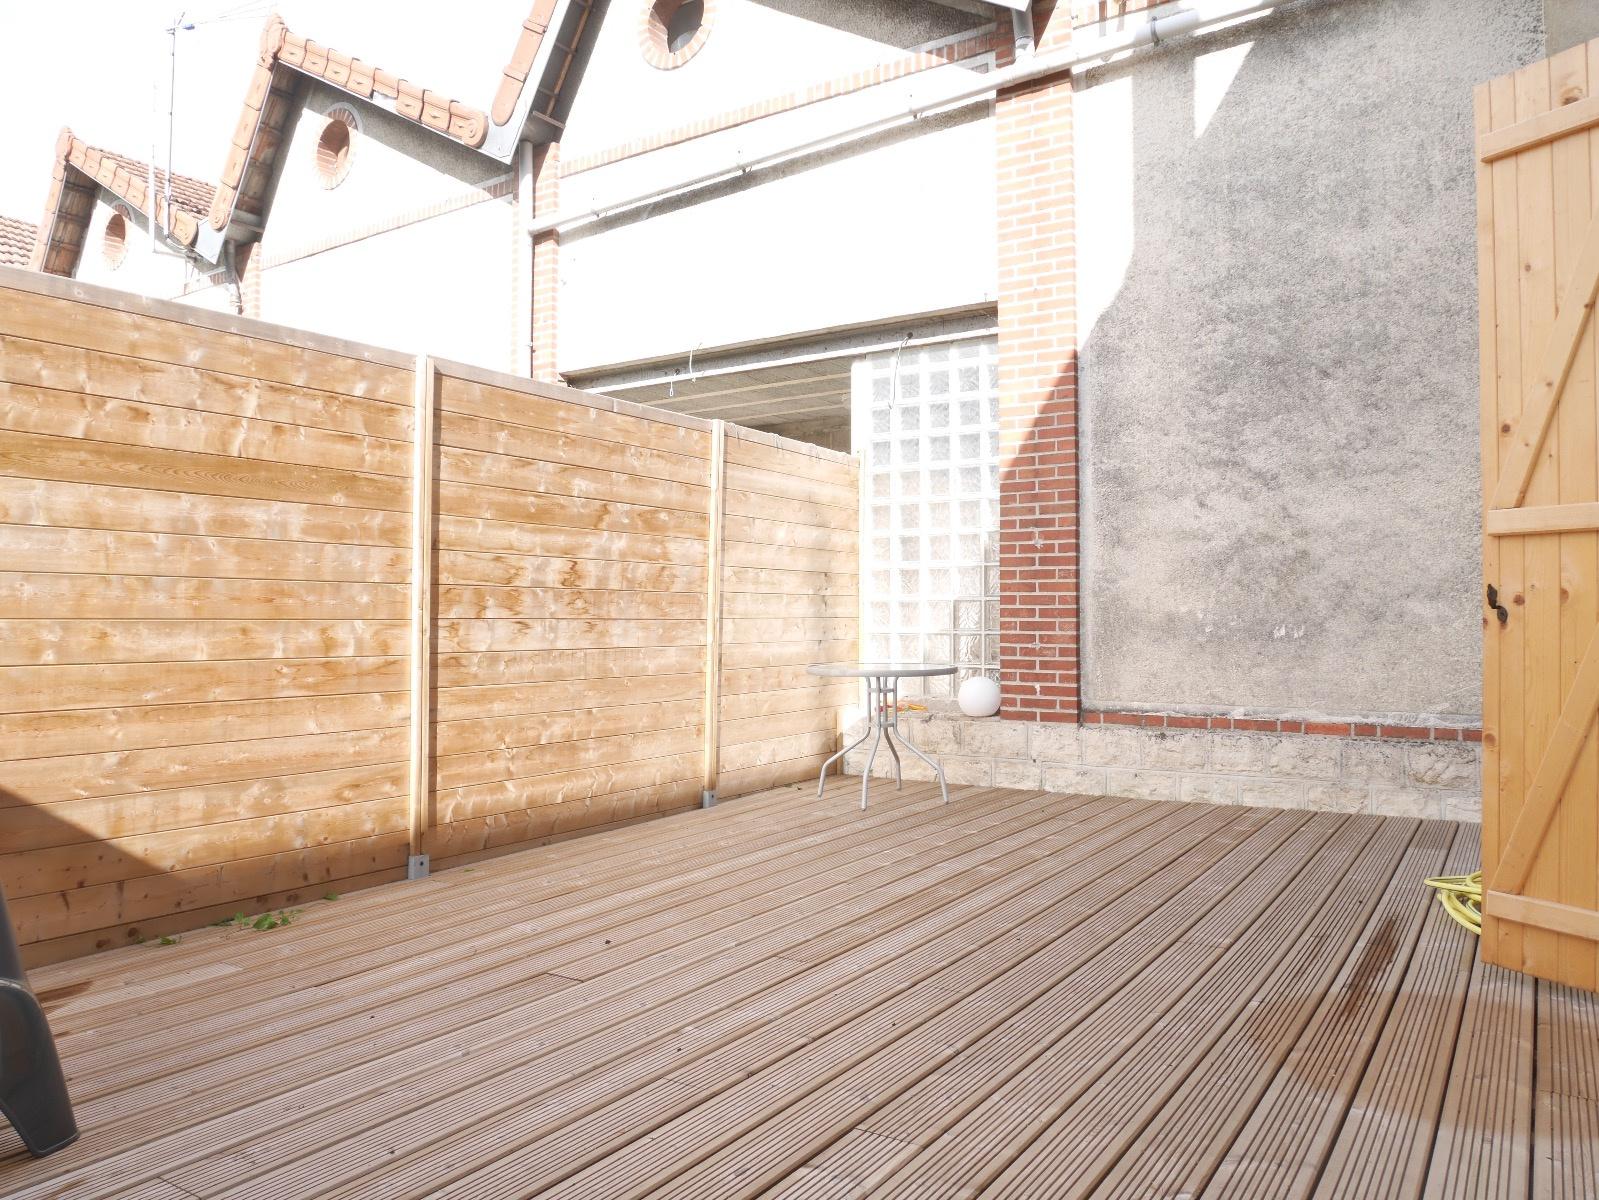 Annonce vente loft troyes 10000 120 m 169 900 992739291263 - Location loft troyes ...